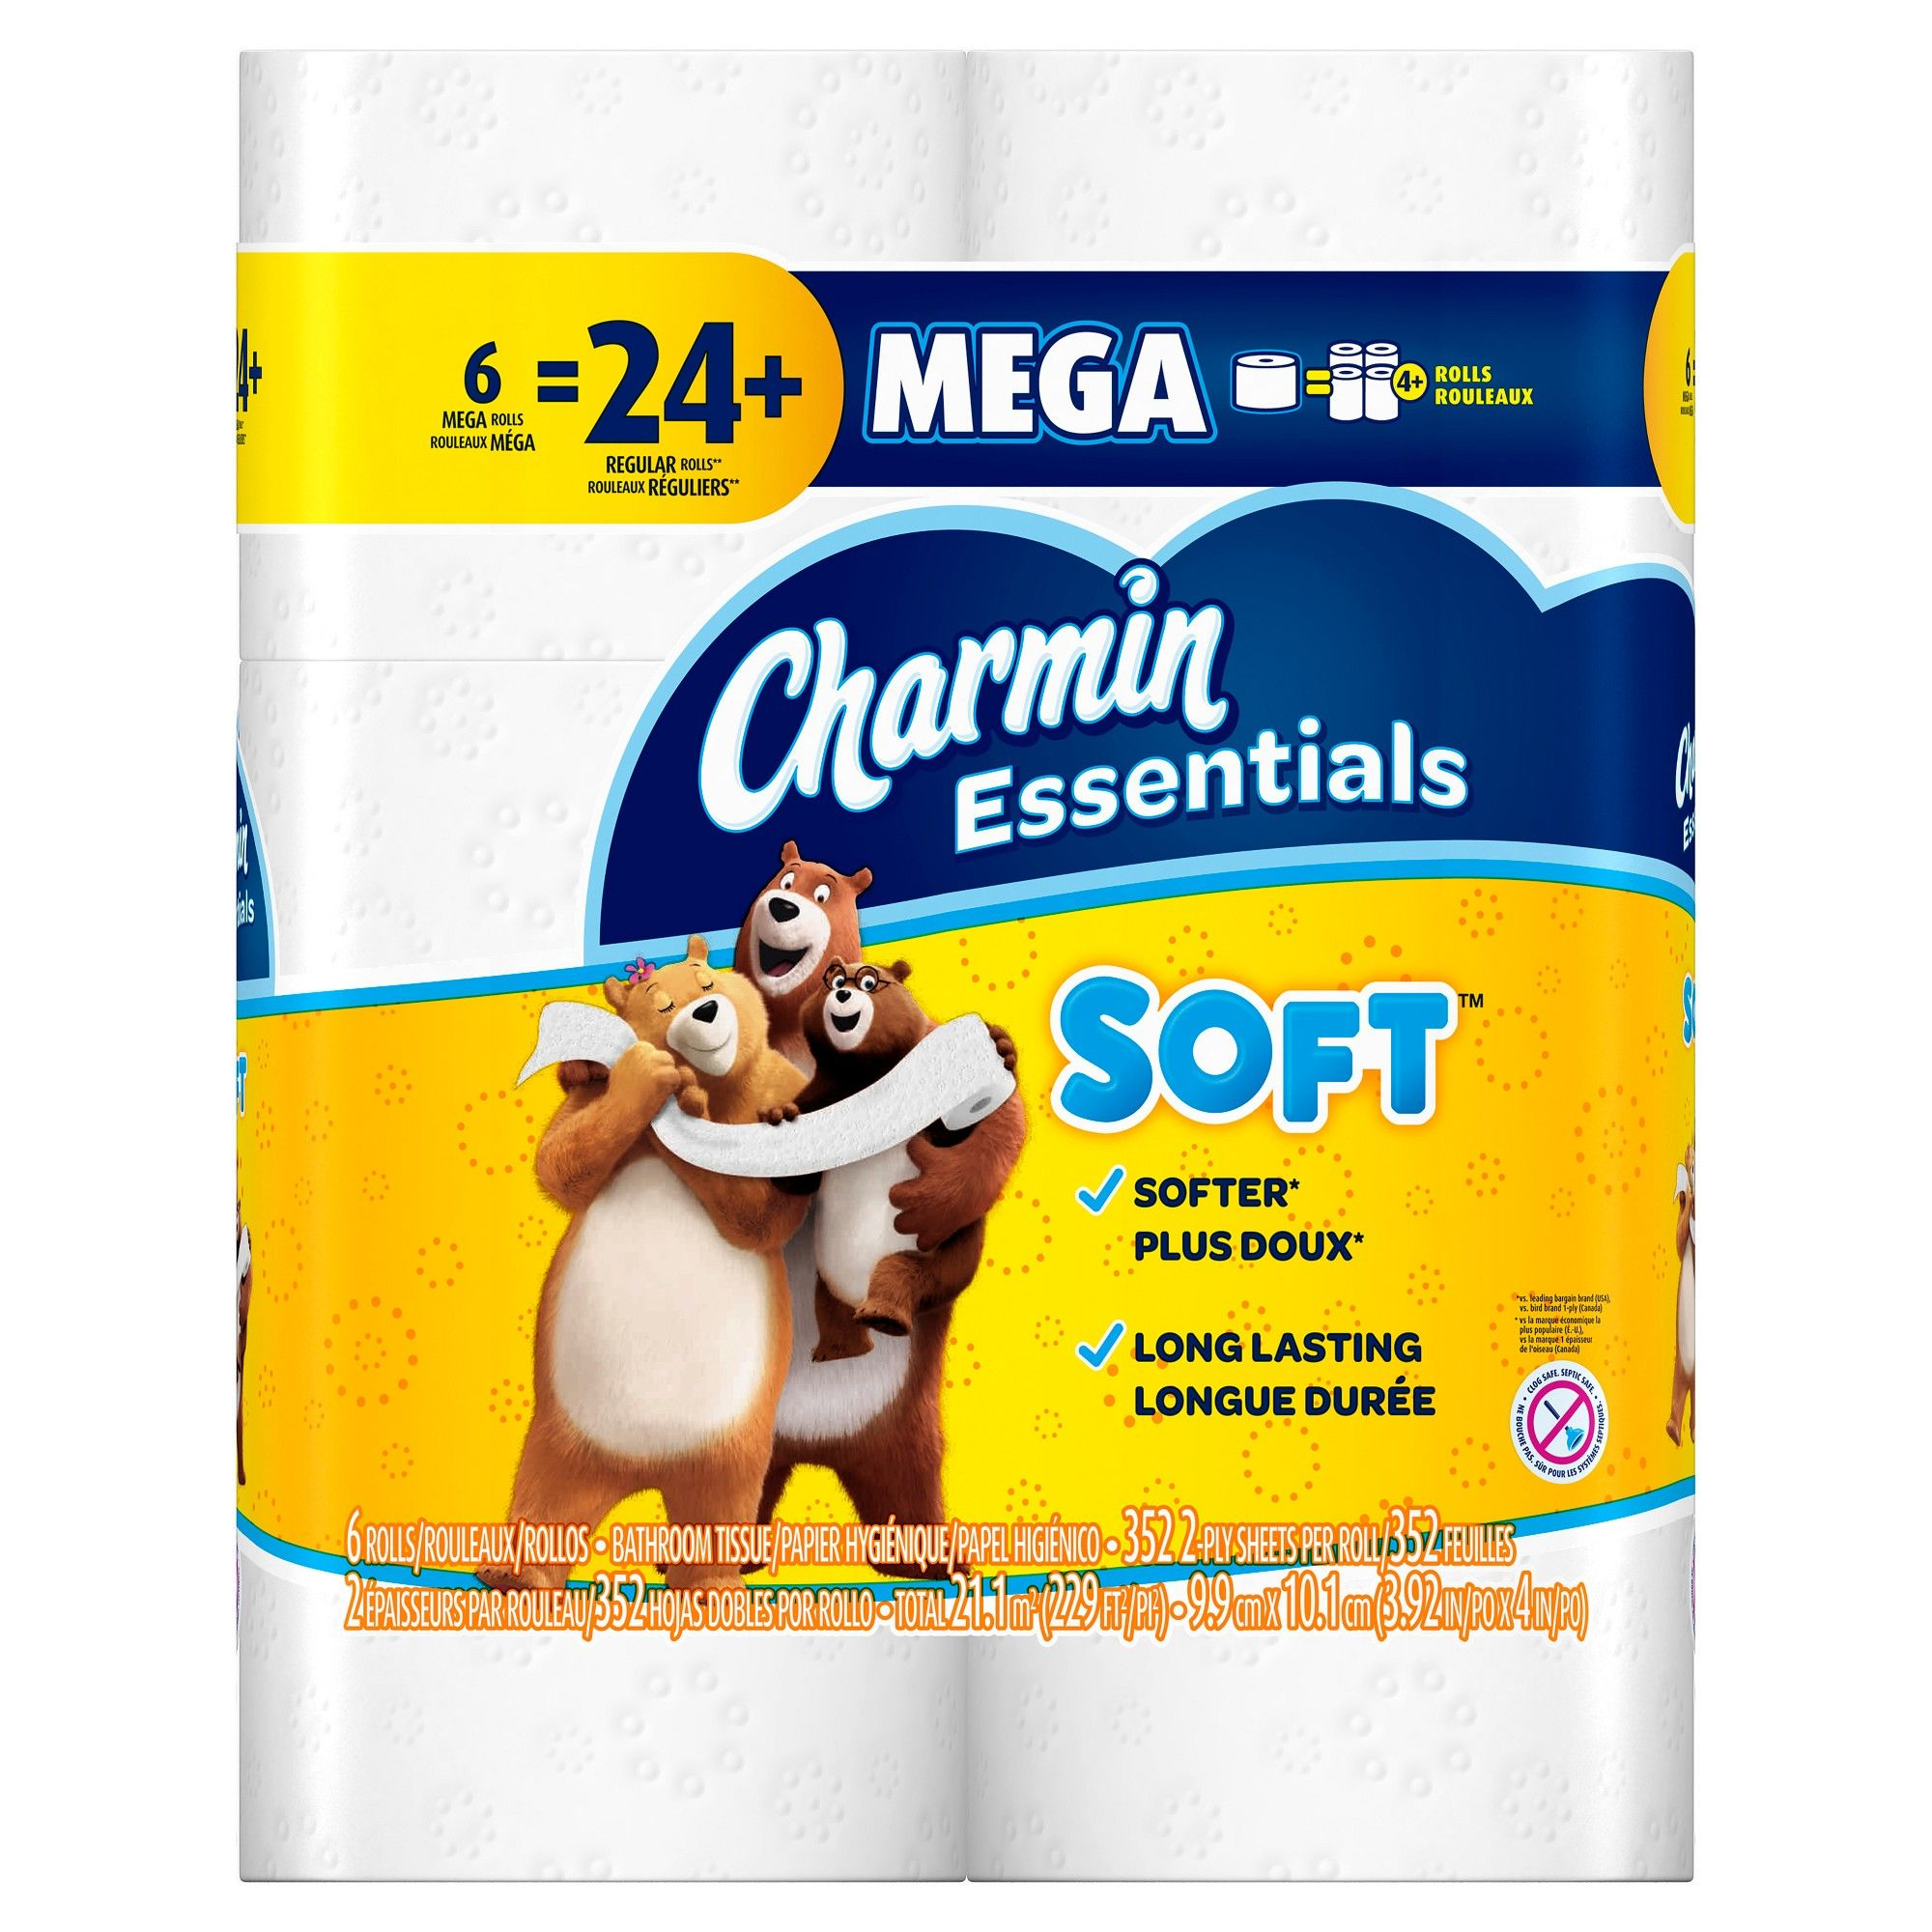 Charmin Essentials Soft Toilet Paper 6 Mega Rolls Bath Tissue Toilet Paper Paper